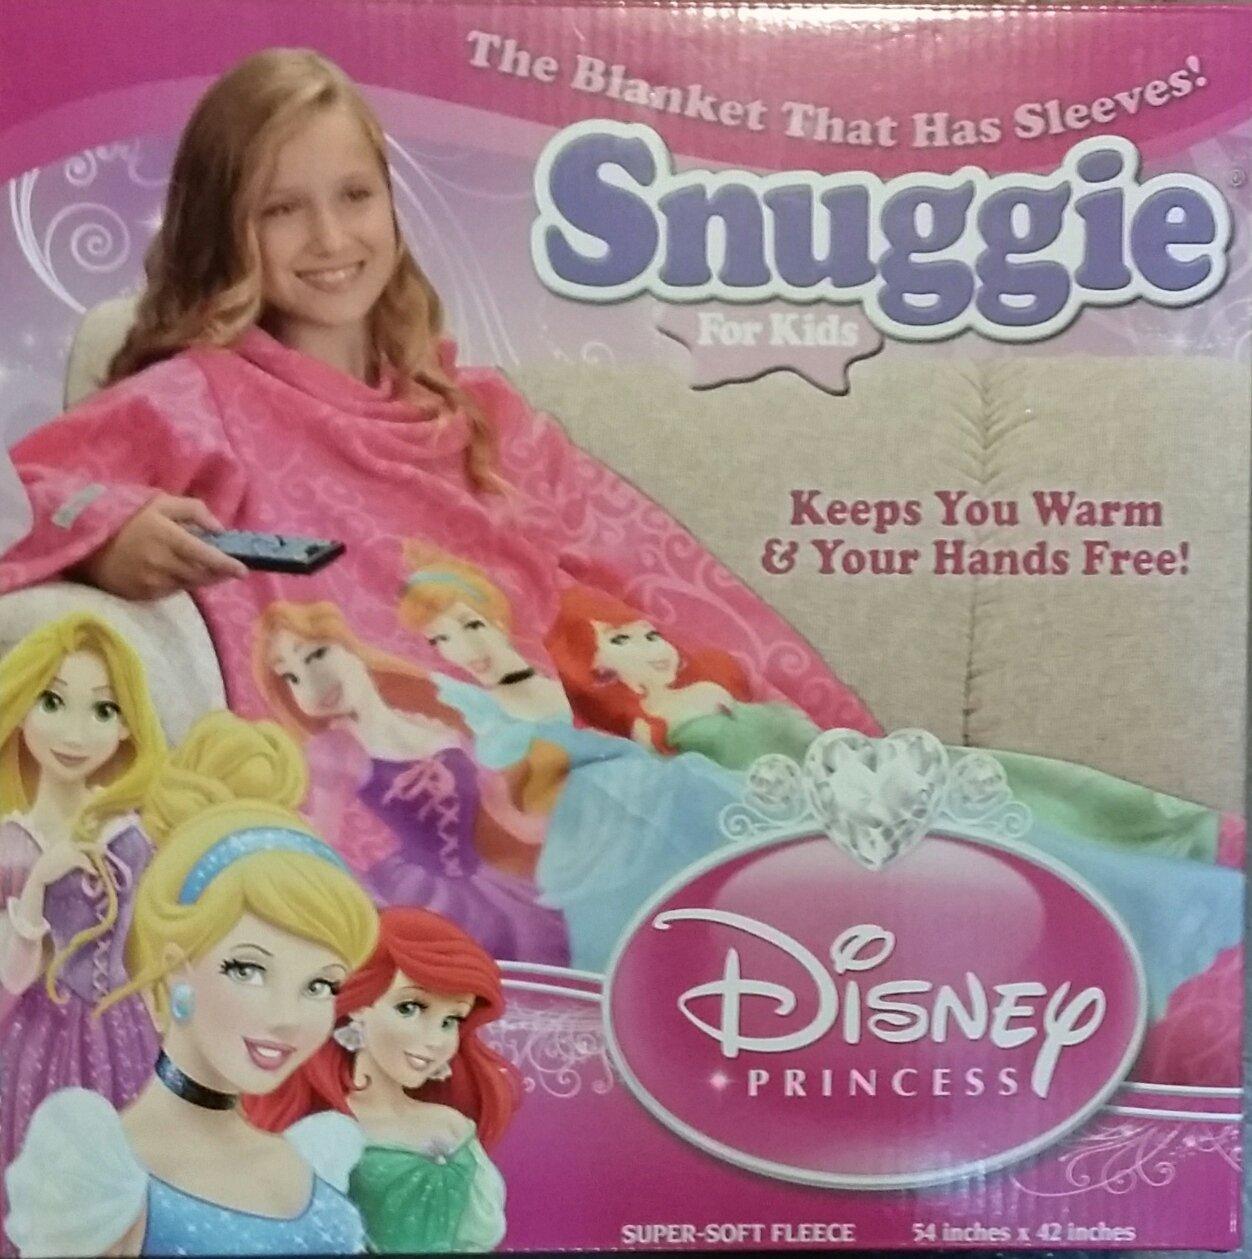 Amazon.com: Disney Princess Snuggie Kids 2014: Home & Kitchen